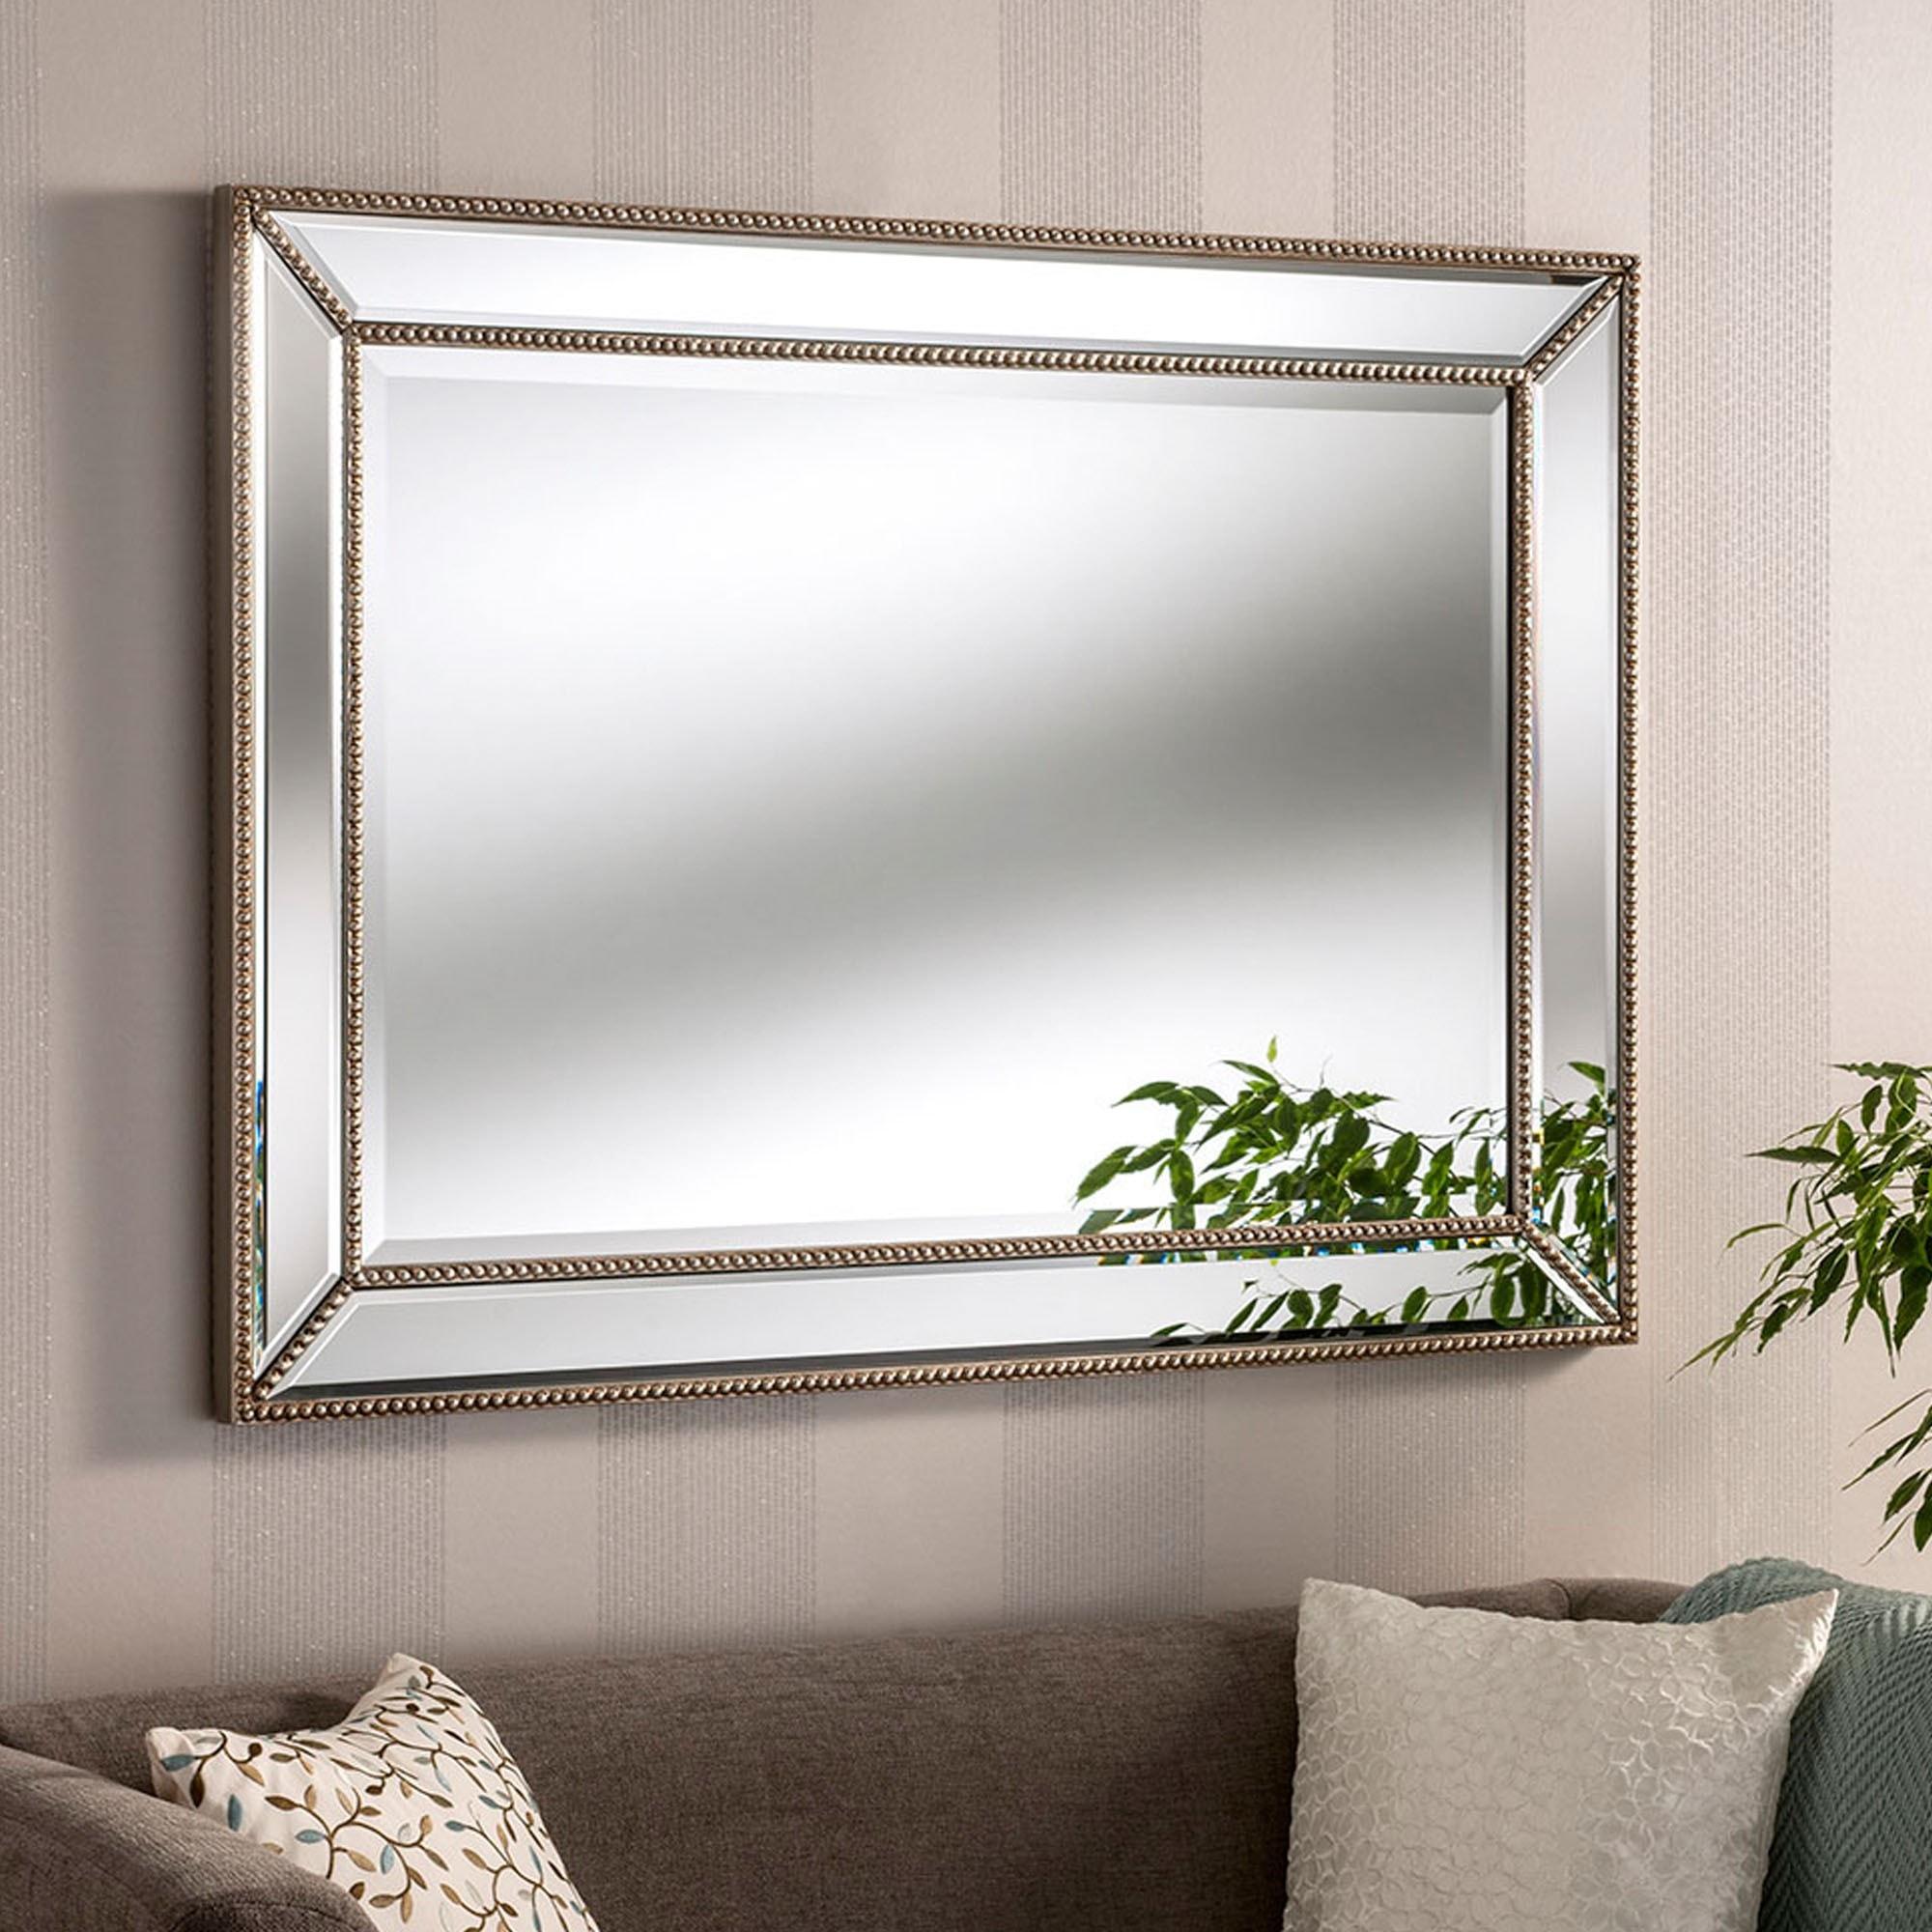 Contemporary Monaco Silver Wall Mirror Contemporary Wall Mirrors